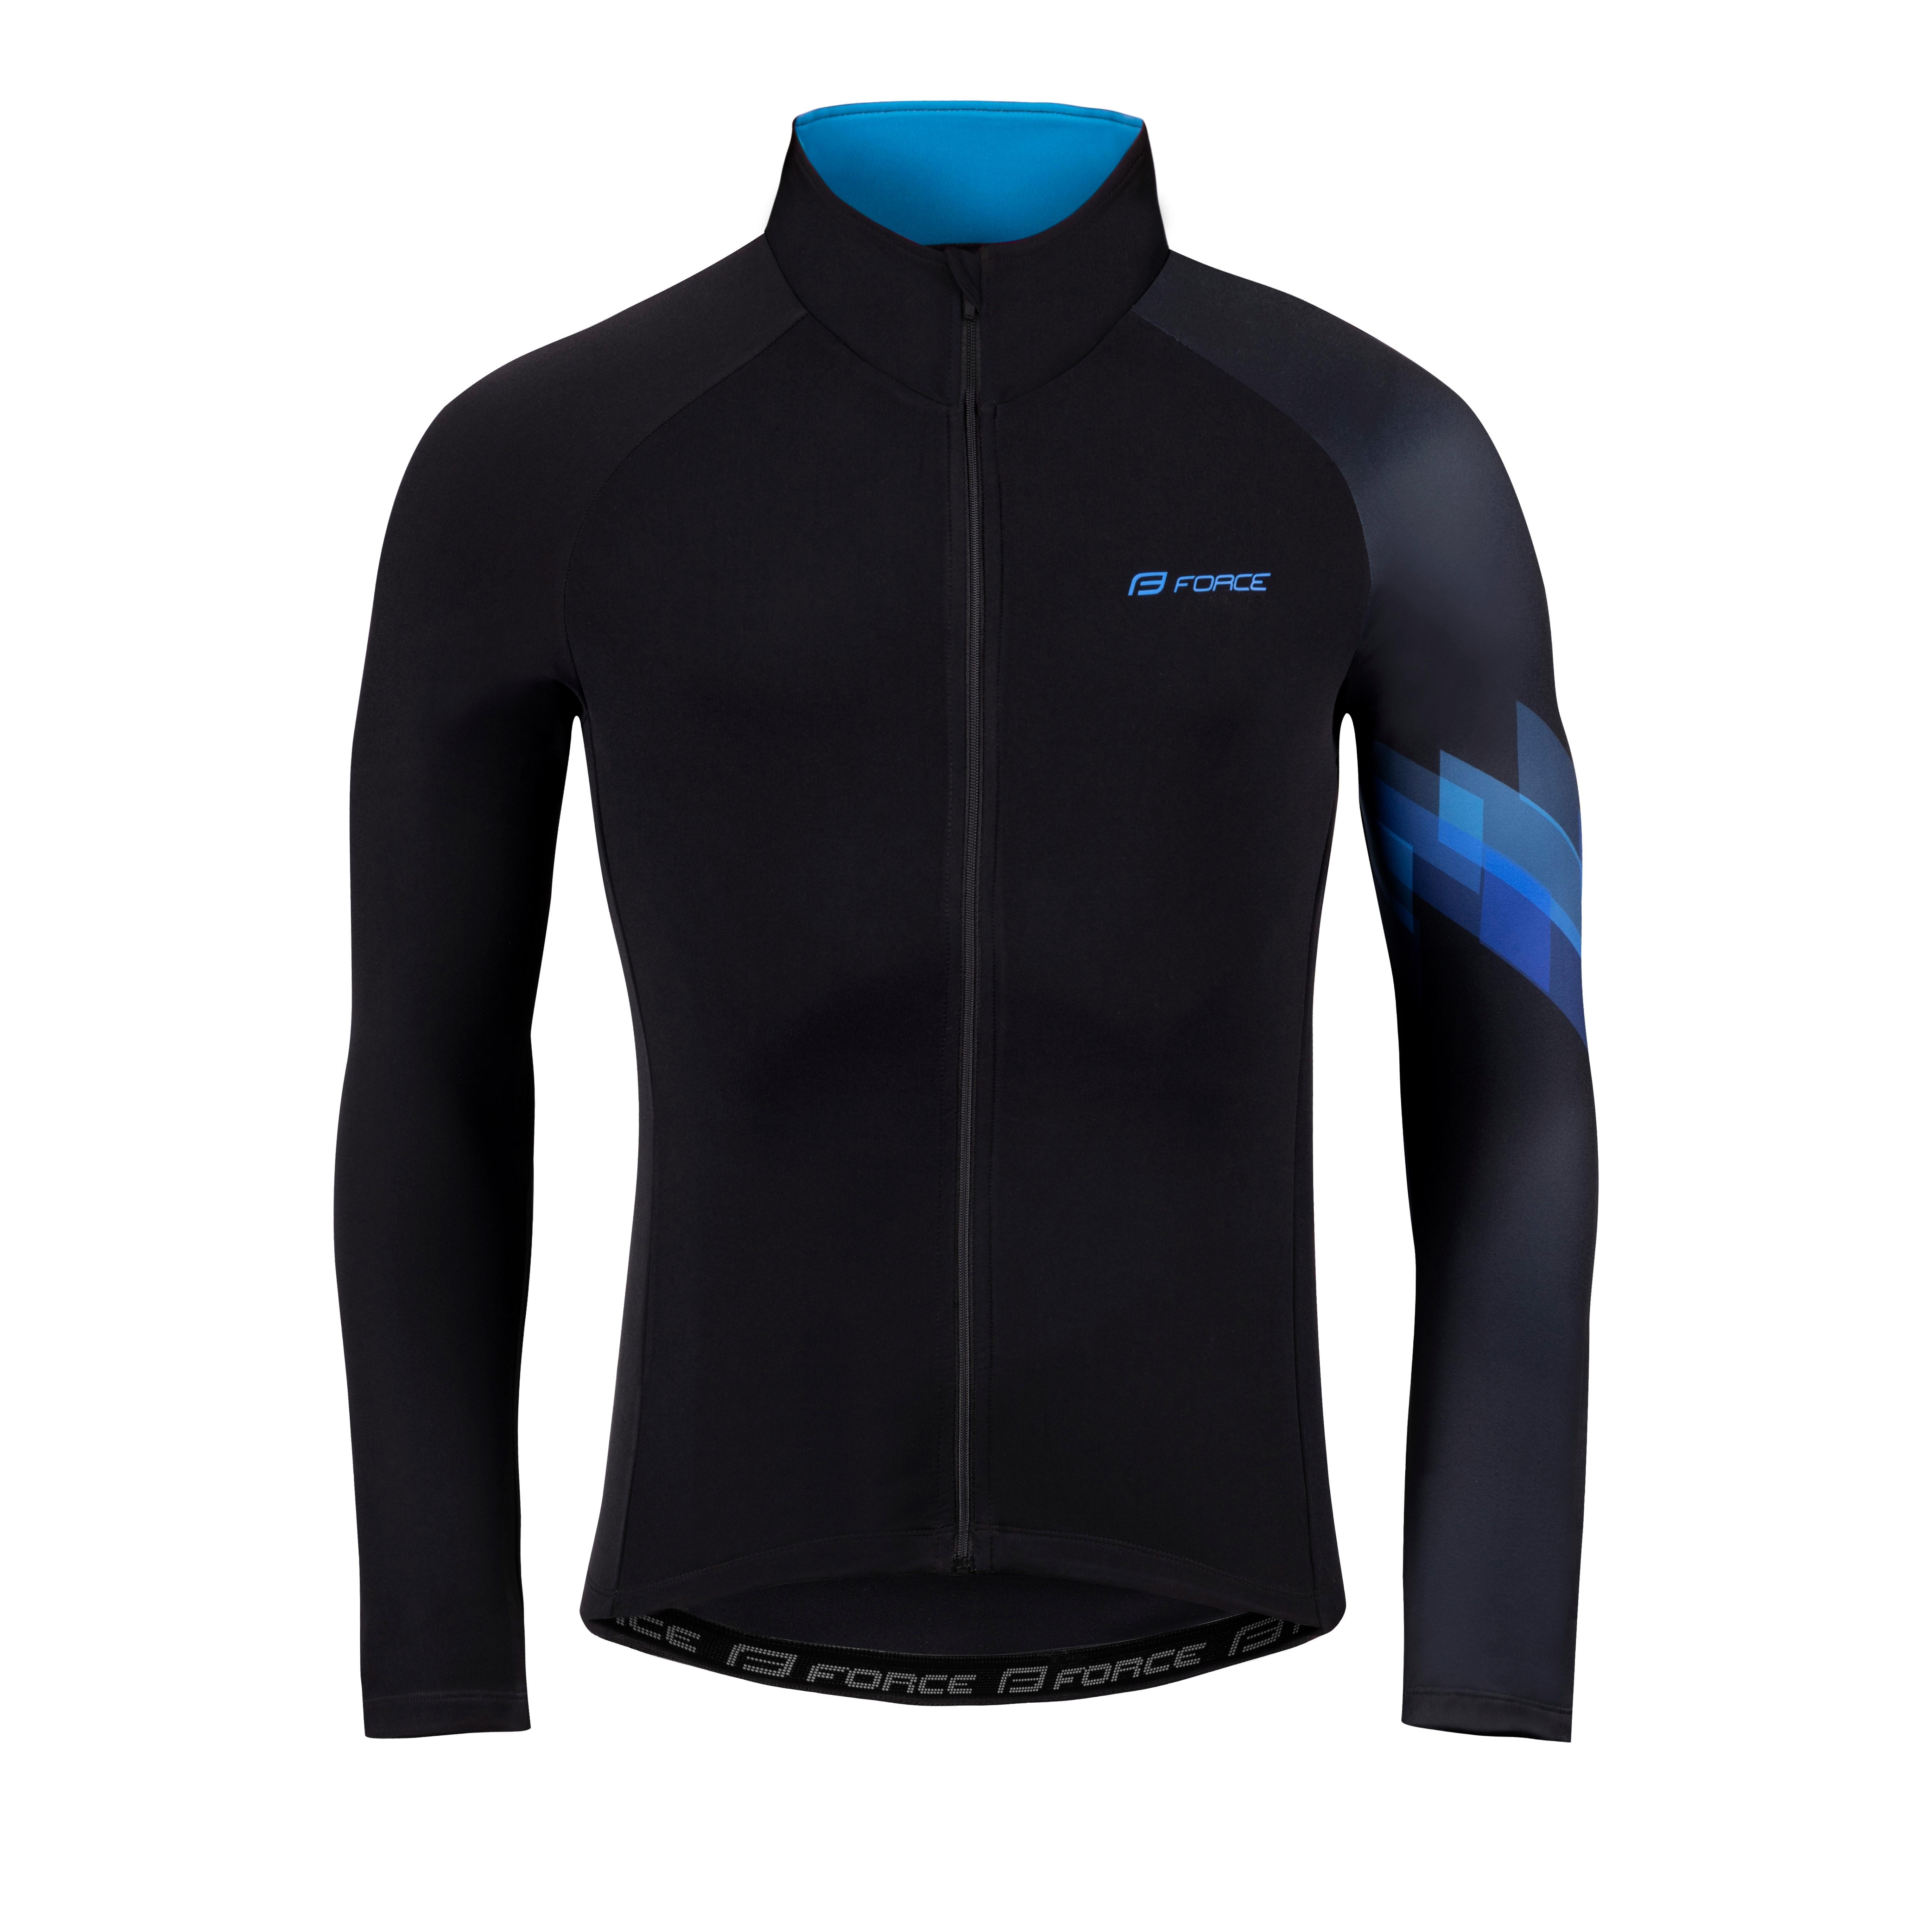 dres FORCE RIDGE dlouhý rukáv, černo-modrý XL